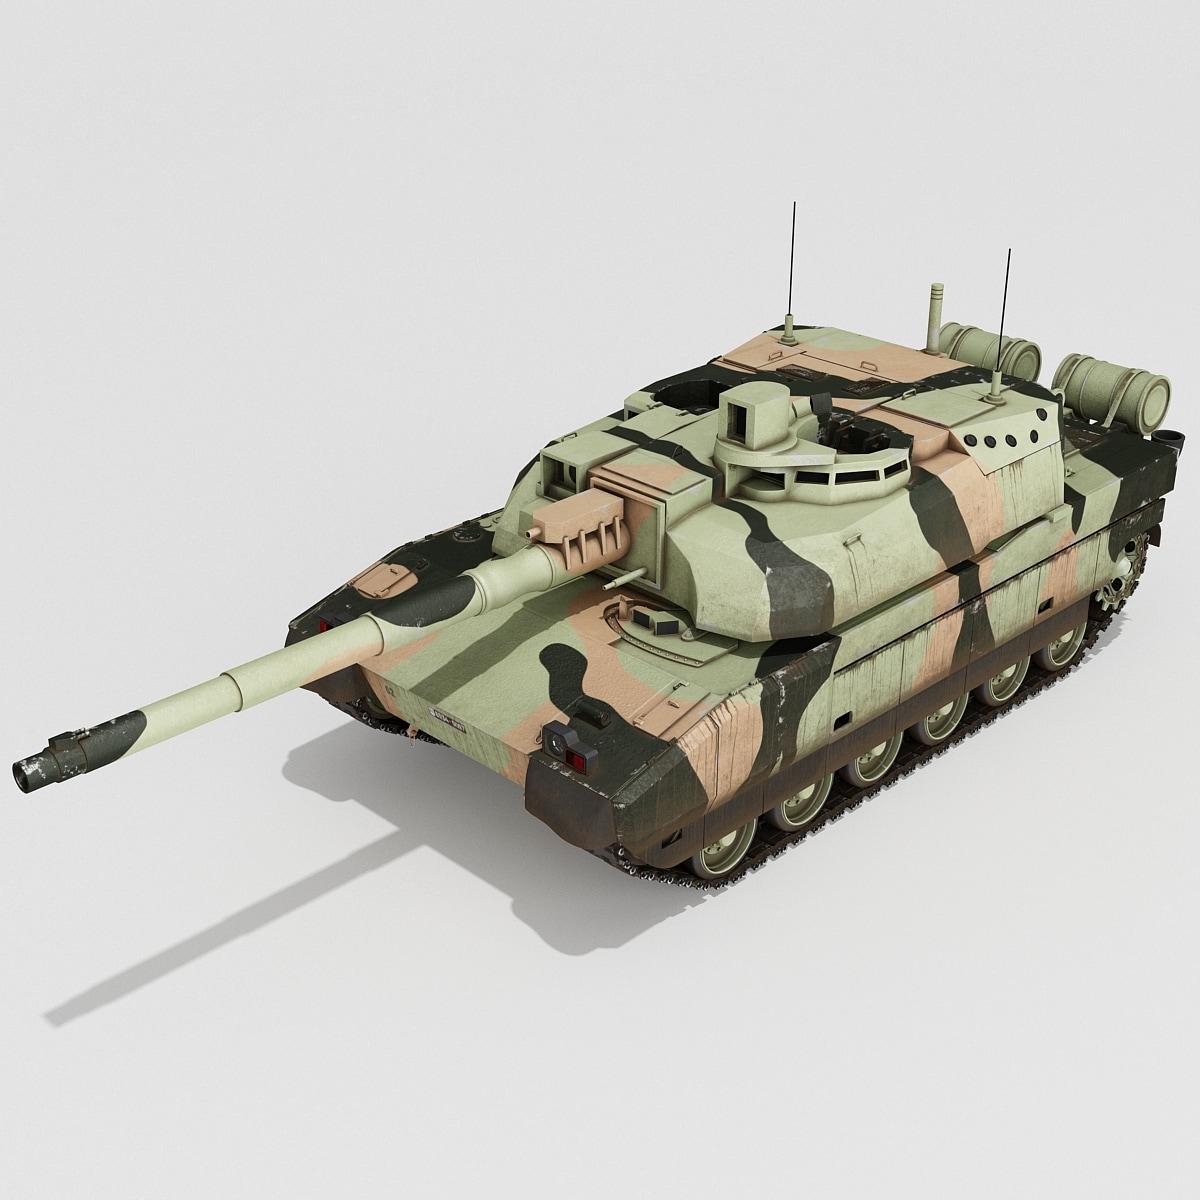 3d french amx-56 main battle tank model